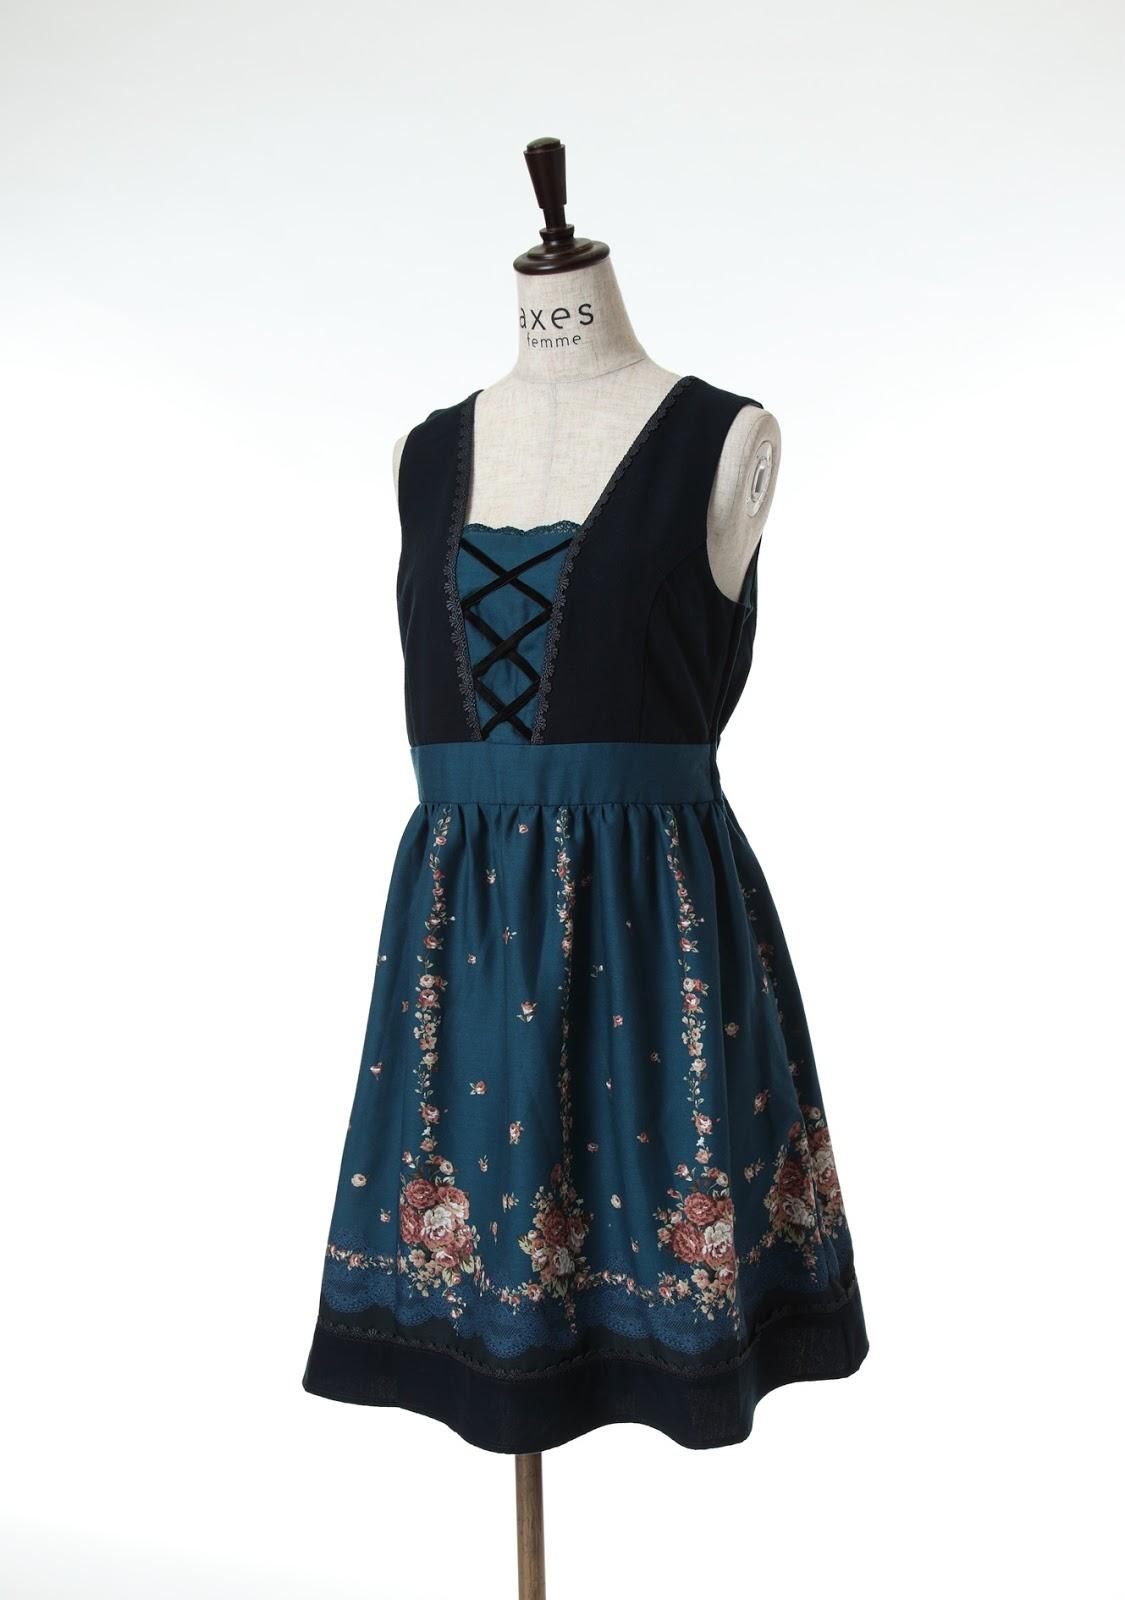 Wear Like A Princess with Japanese Fashion Brand Axes Femme